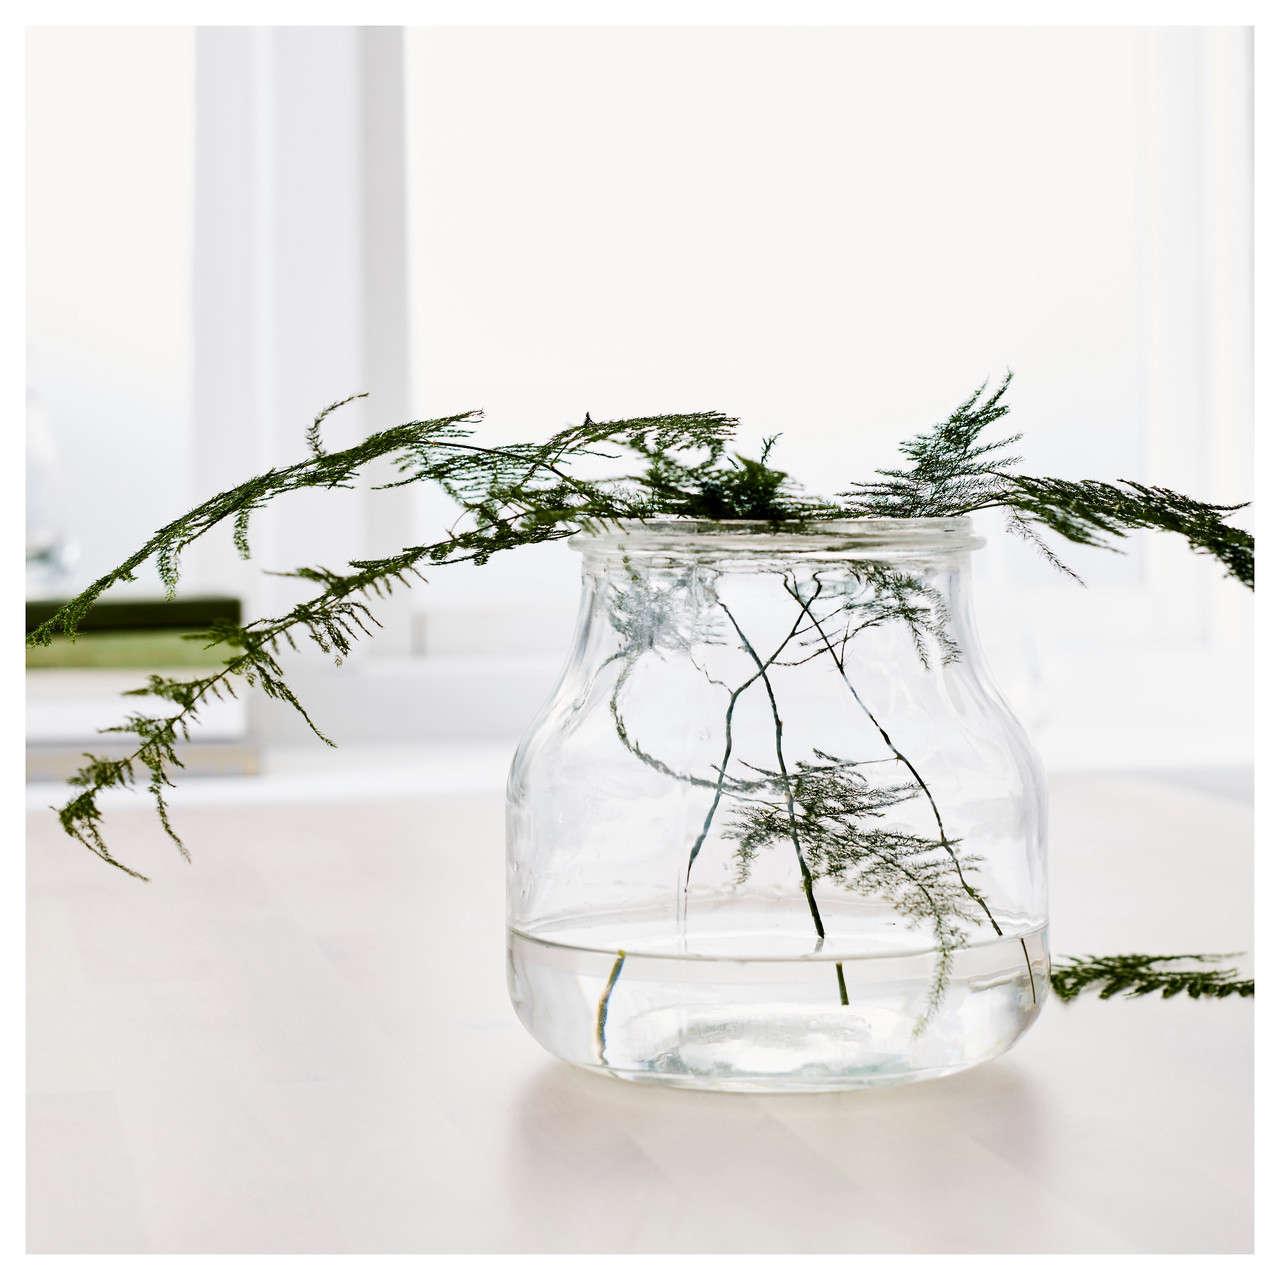 Editors picks 10 ikea favorites for indoor gardens gardenista ikea ensdig vase reviewsmspy